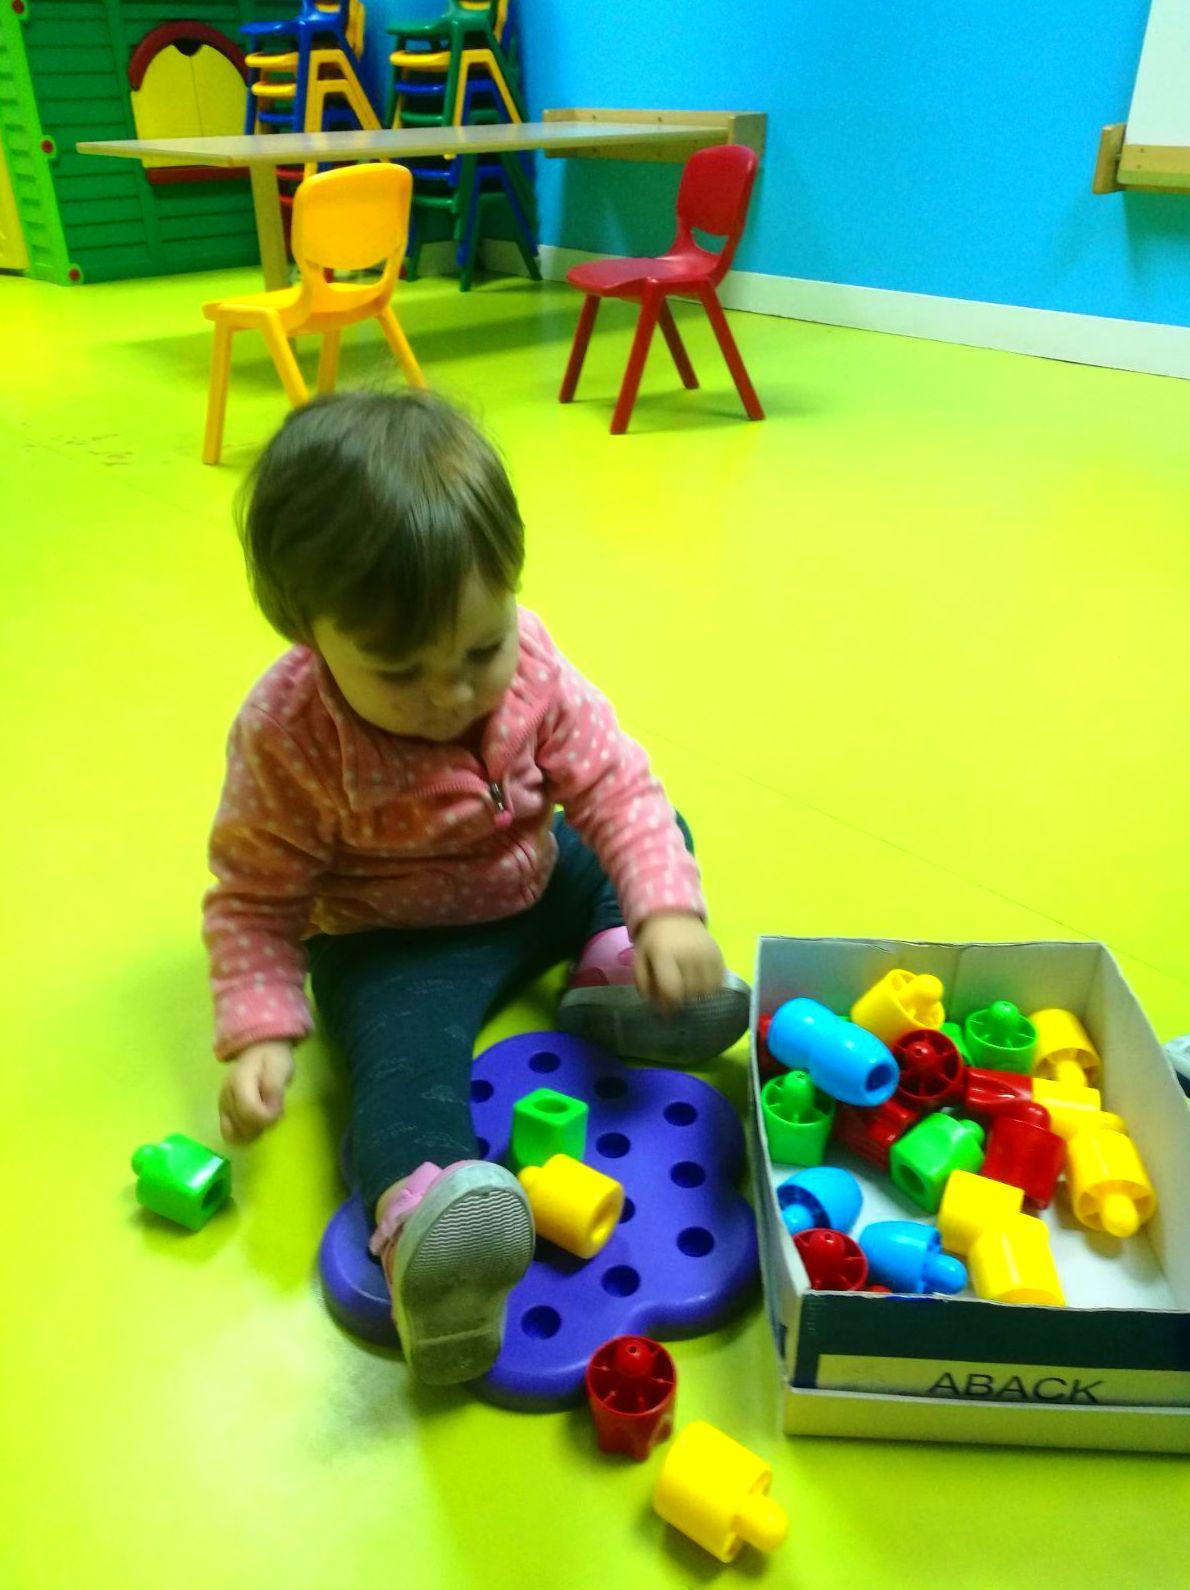 Foto 18 de Escuela infantil en Algete | E.I. Cuatro Pecas de Colores